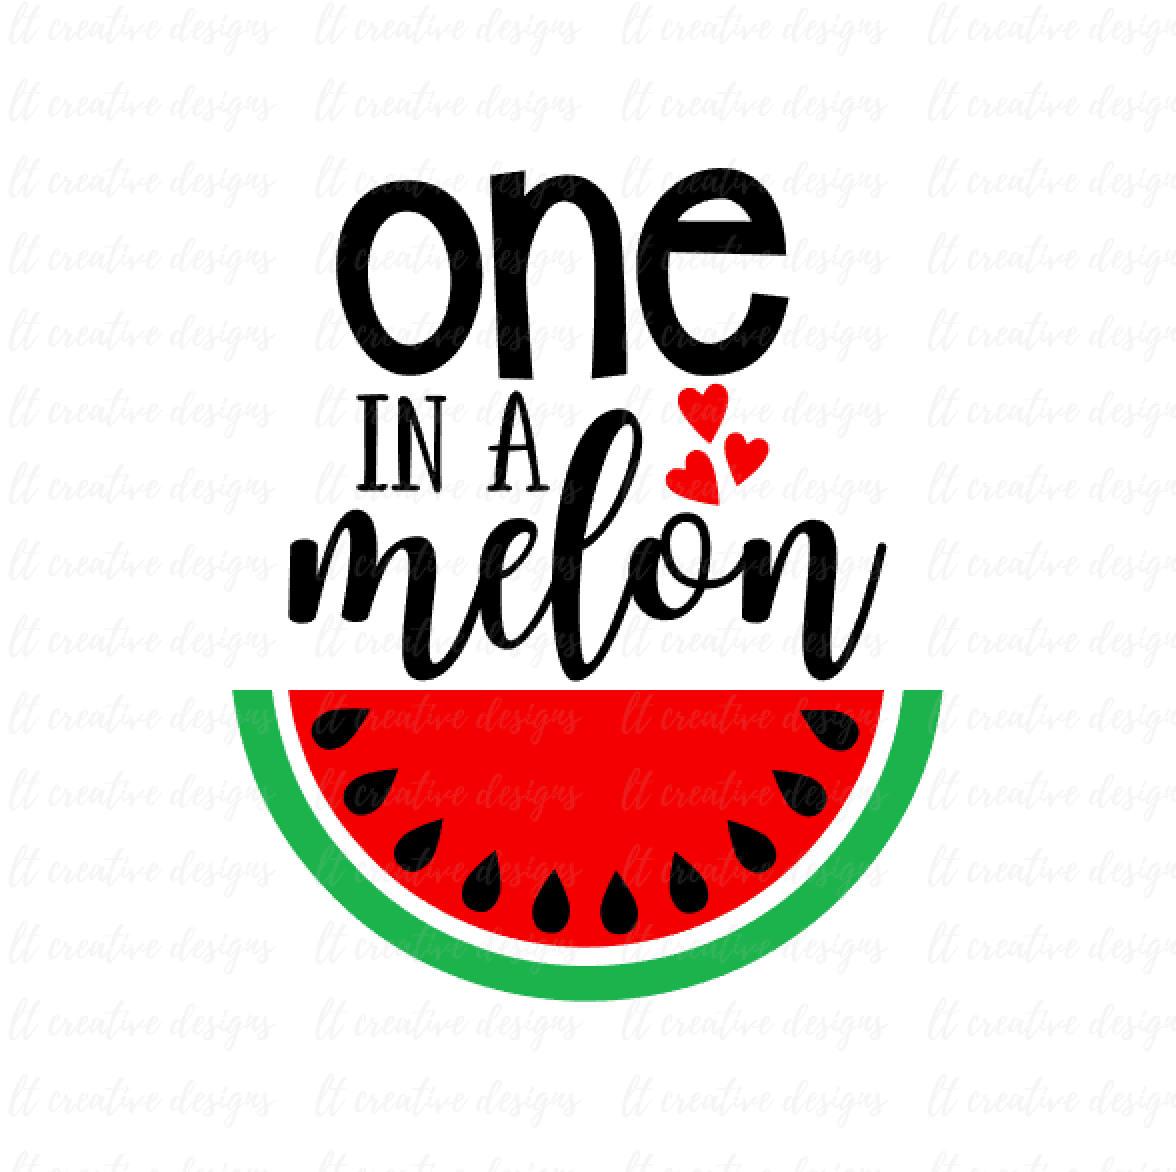 One in a melon. 1 clipart watermelon